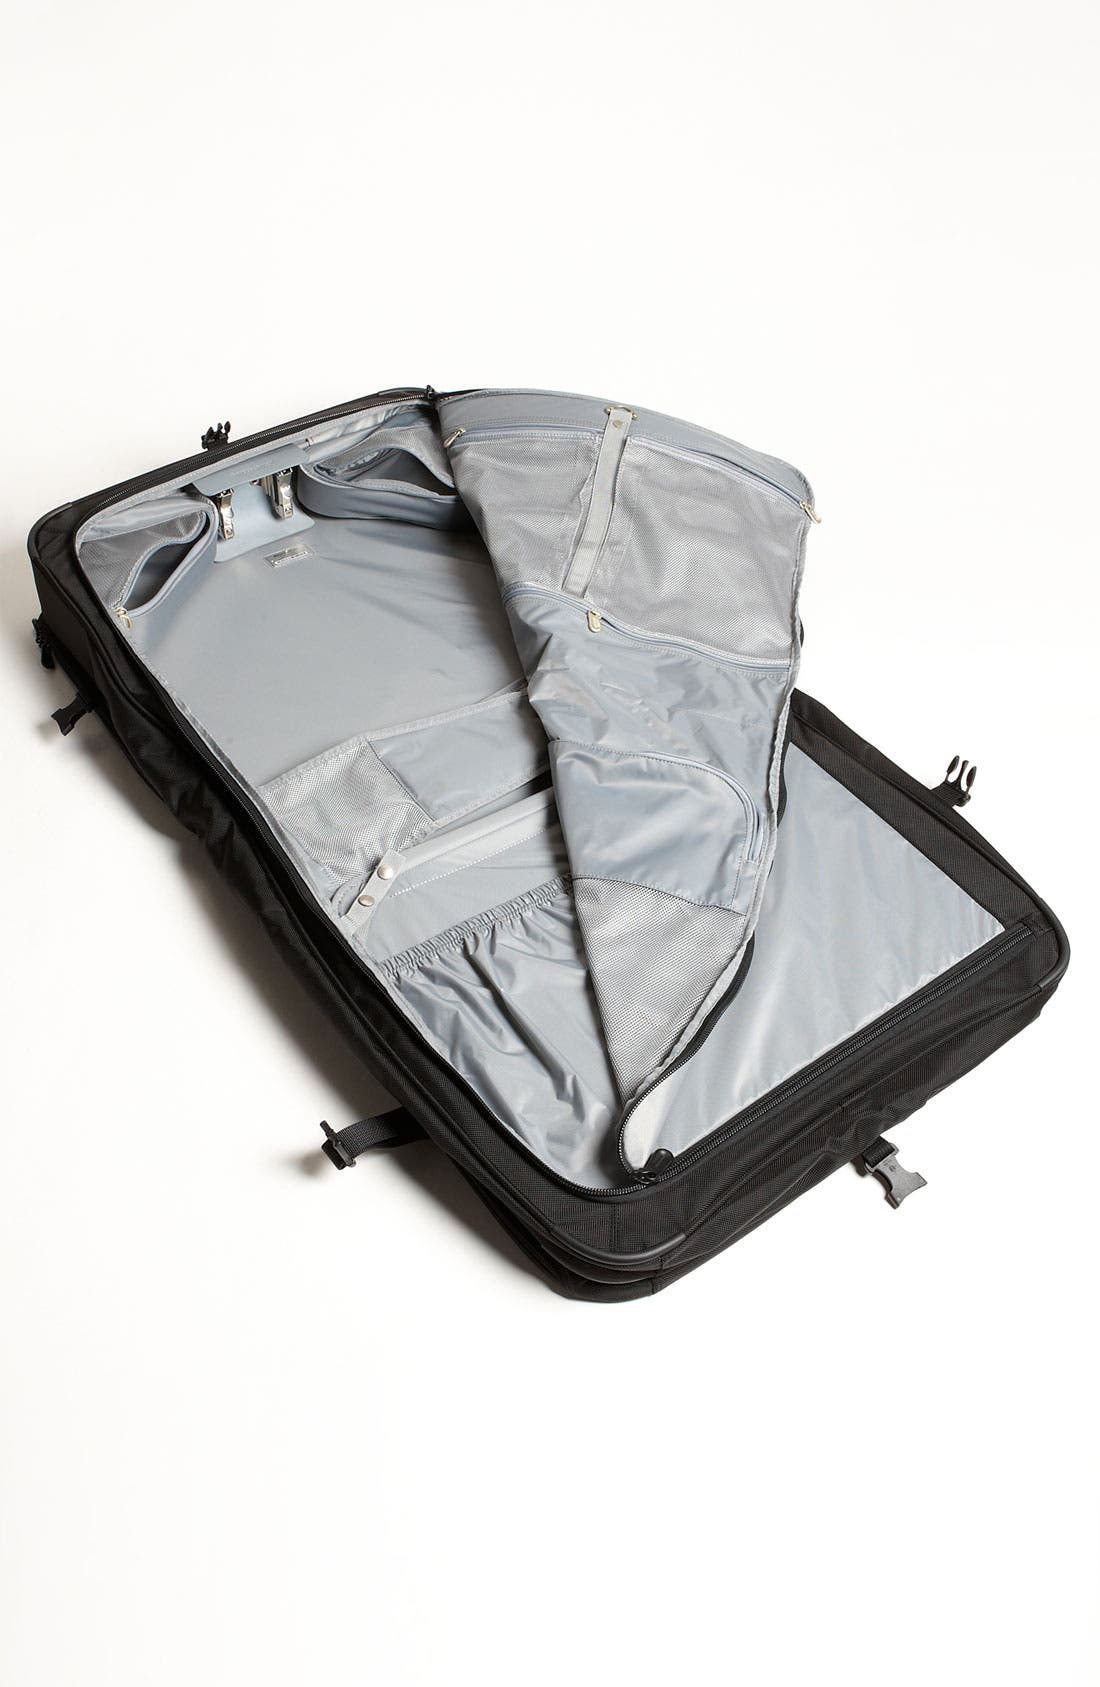 Alternate Image 3  - Briggs & Riley 'Baseline - Deluxe' Garment Bag (22 Inch)